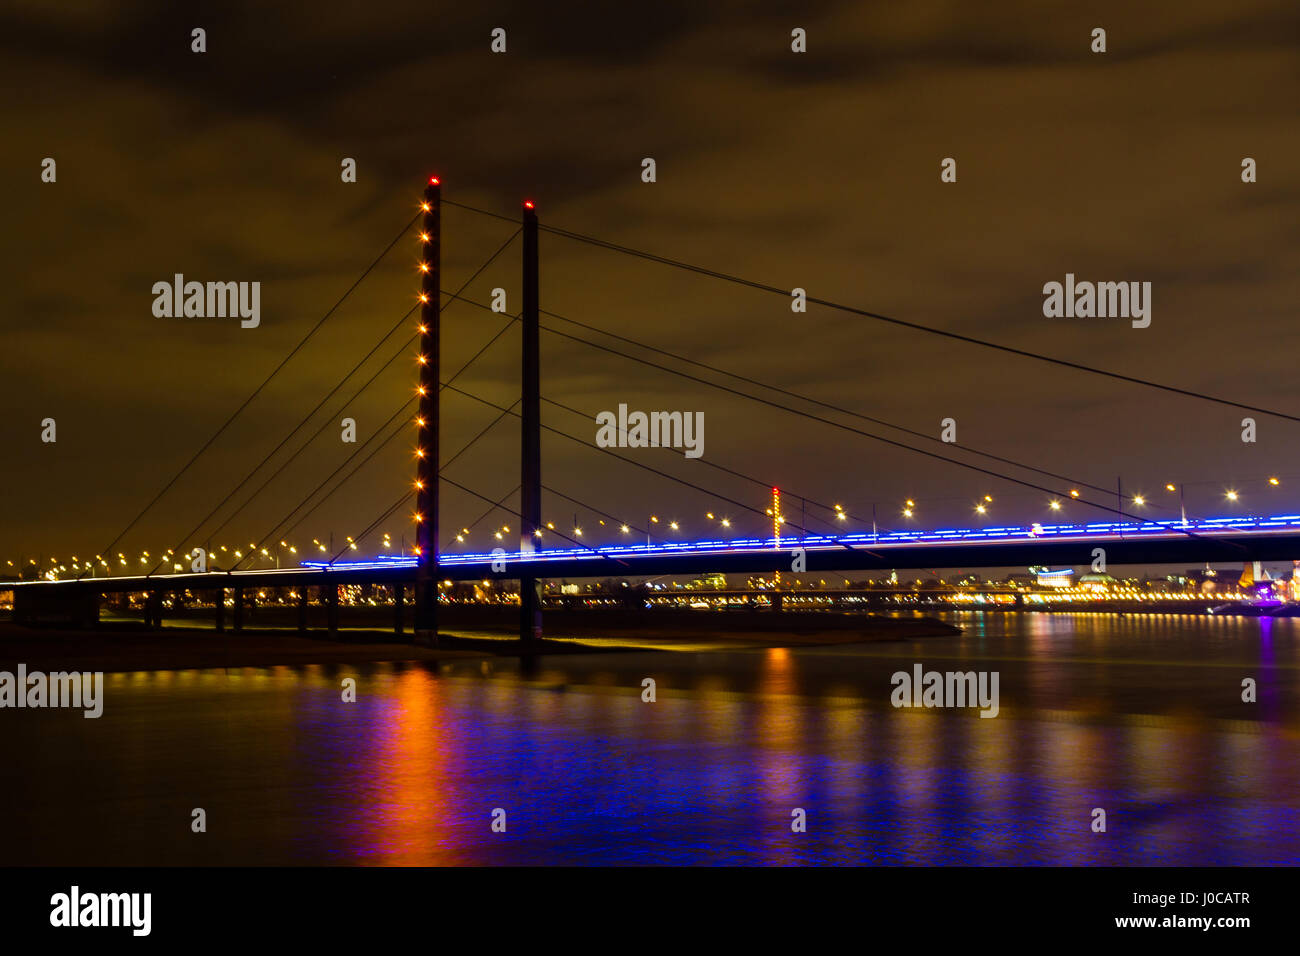 Rhine bridge at night in Dusseldorf, Germany Stock Photo